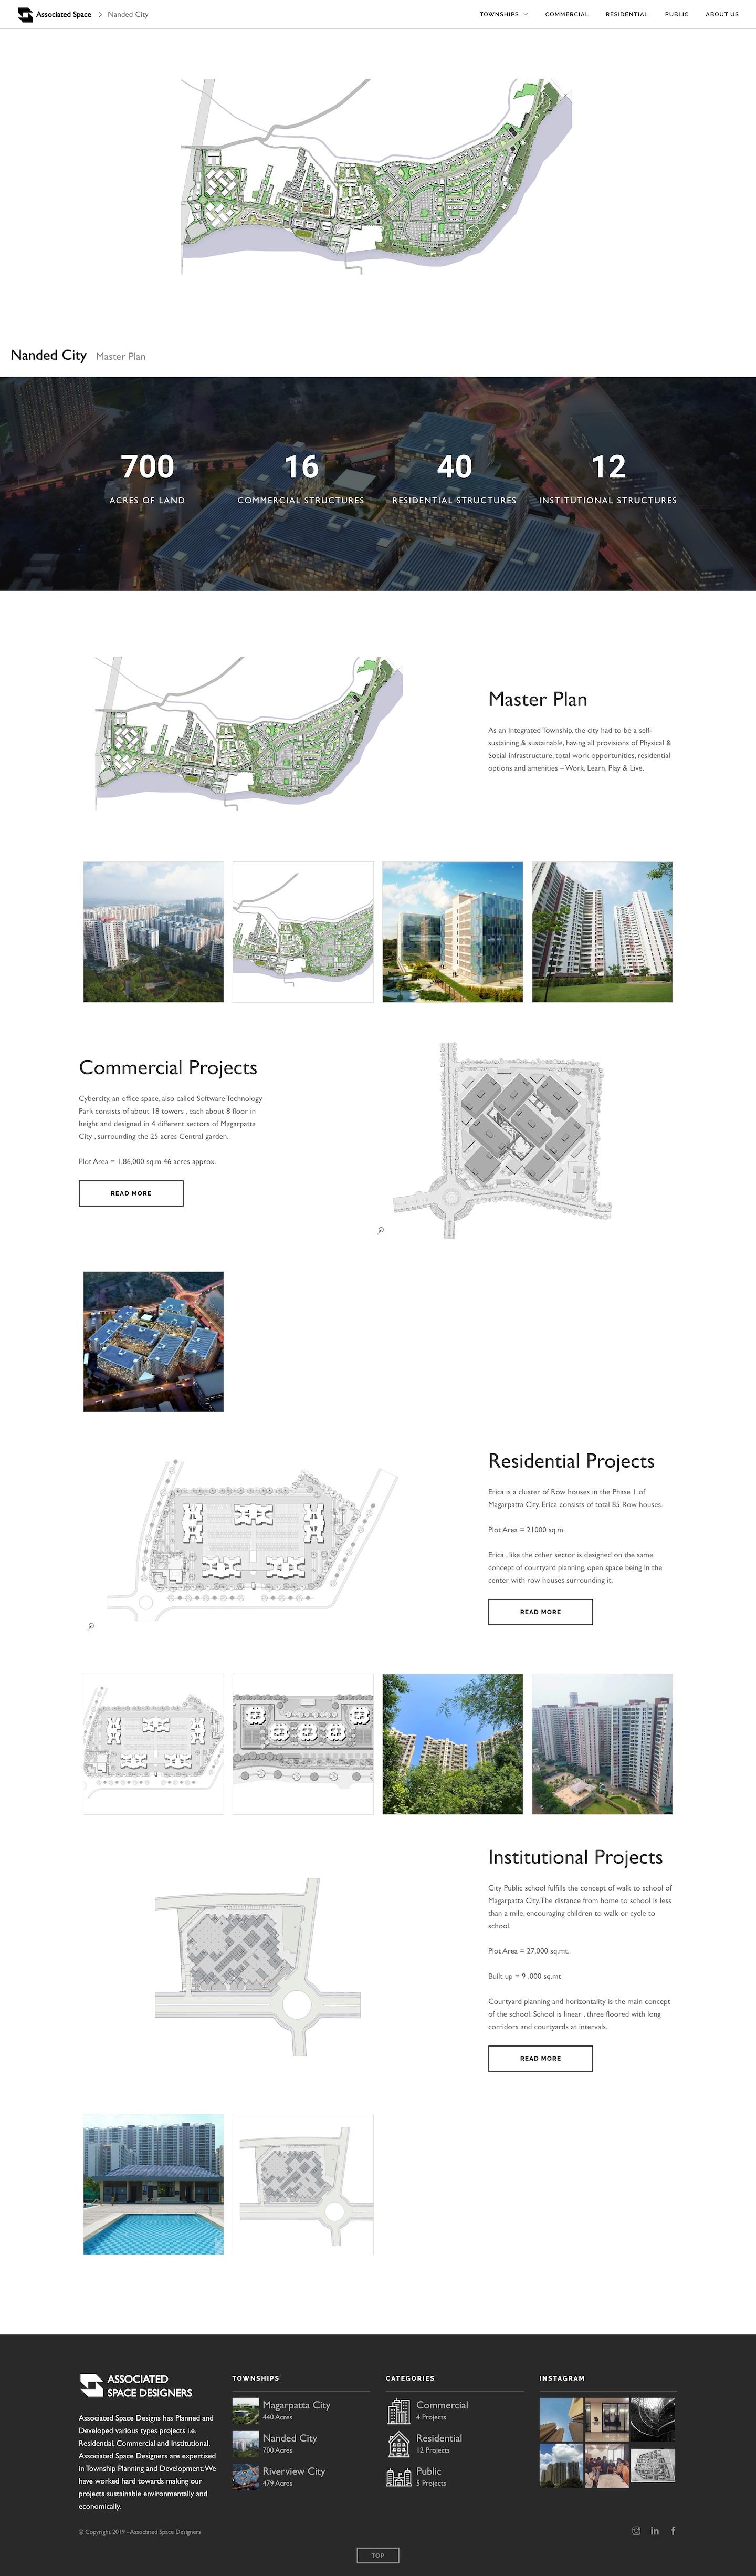 associated.space-Laravel-CMS-Website-Development-Pune-India-2